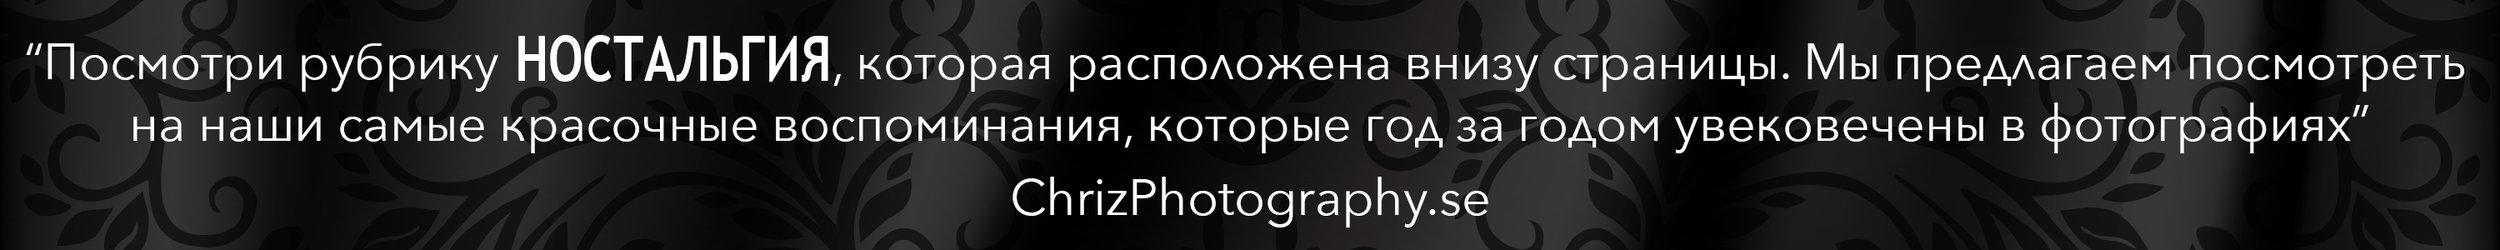 RU_Nostalgi_Inspiring.se_copyright_ChrizPhotography.se_intro_start_banner.jpg